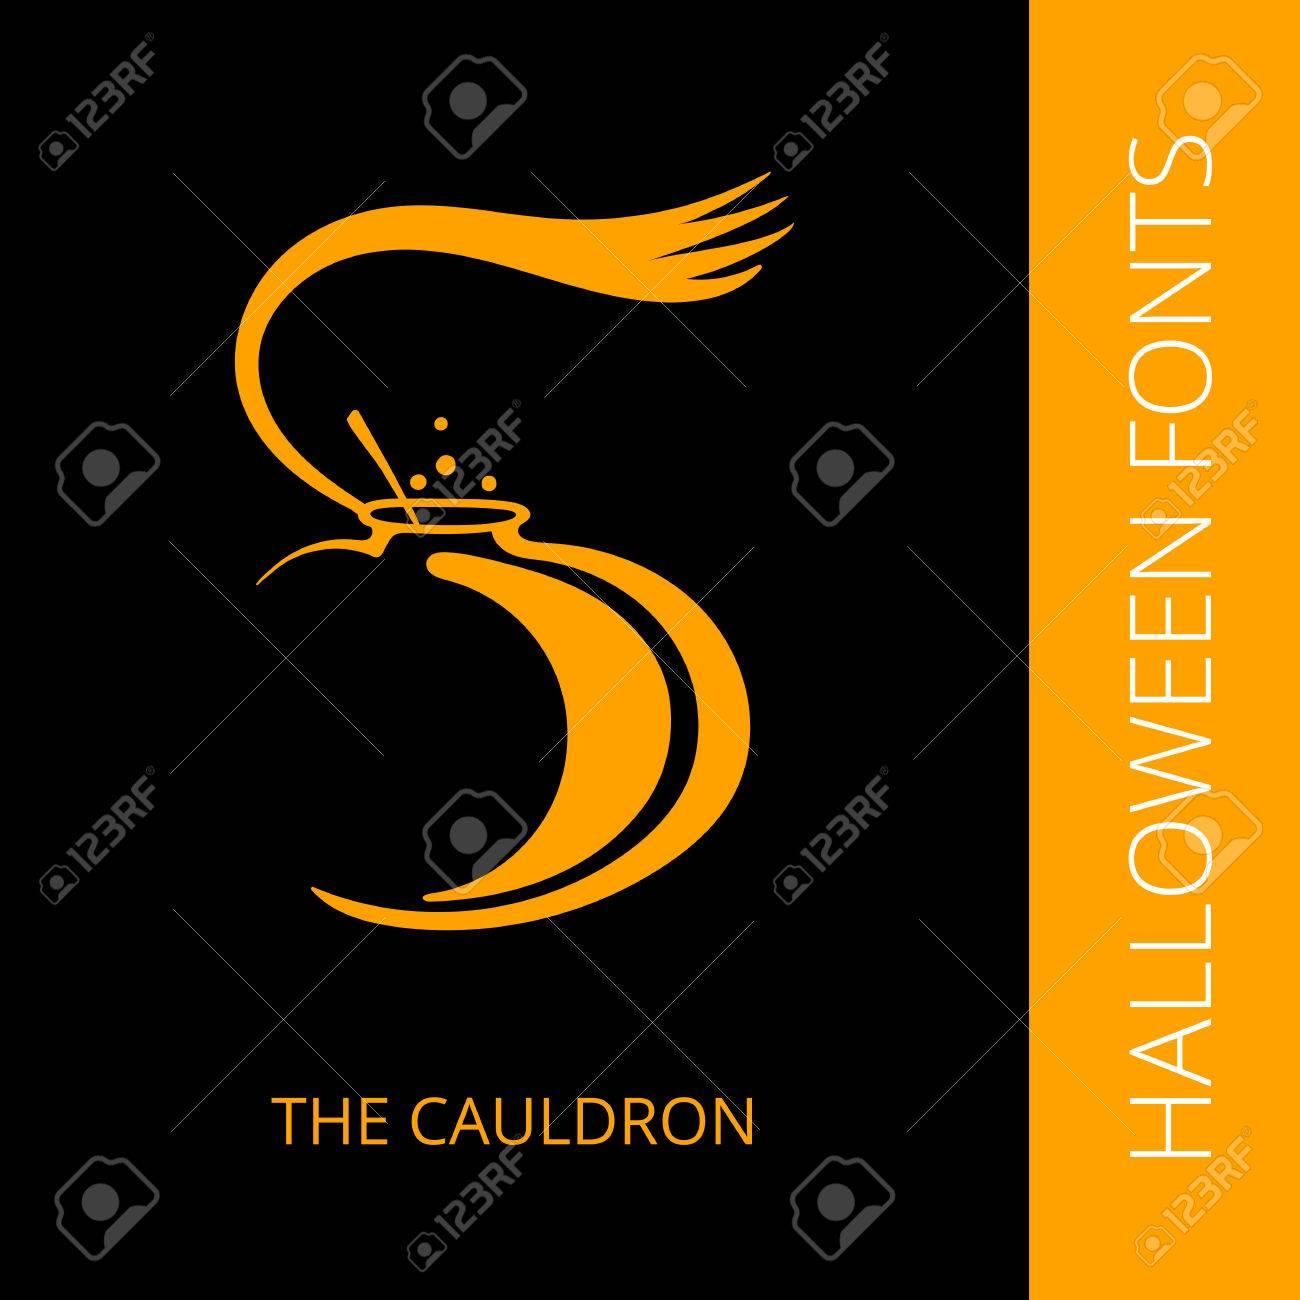 Halloween Design Vector Font Letter S Consist Of The Cauldron